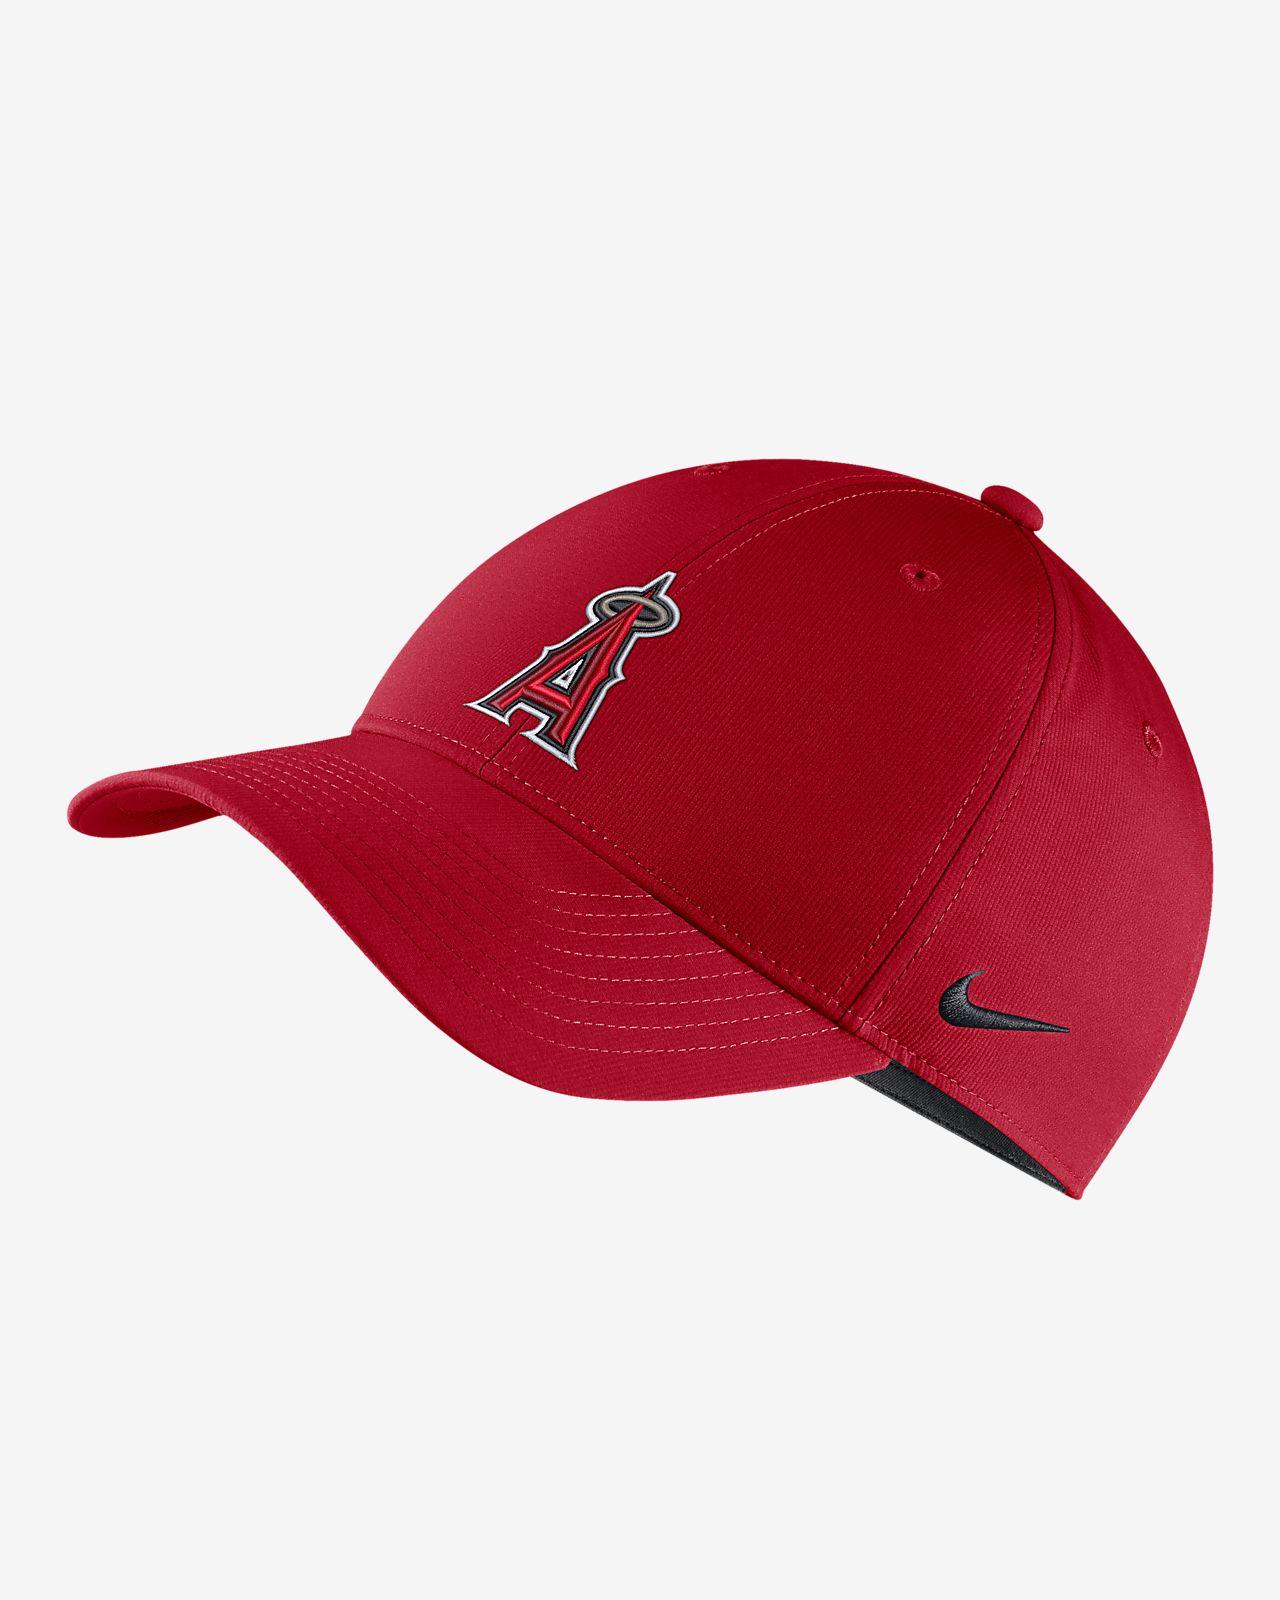 421c7716cb8 Nike Dri-FIT Legacy91 (MLB Angels) Hat. Nike.com